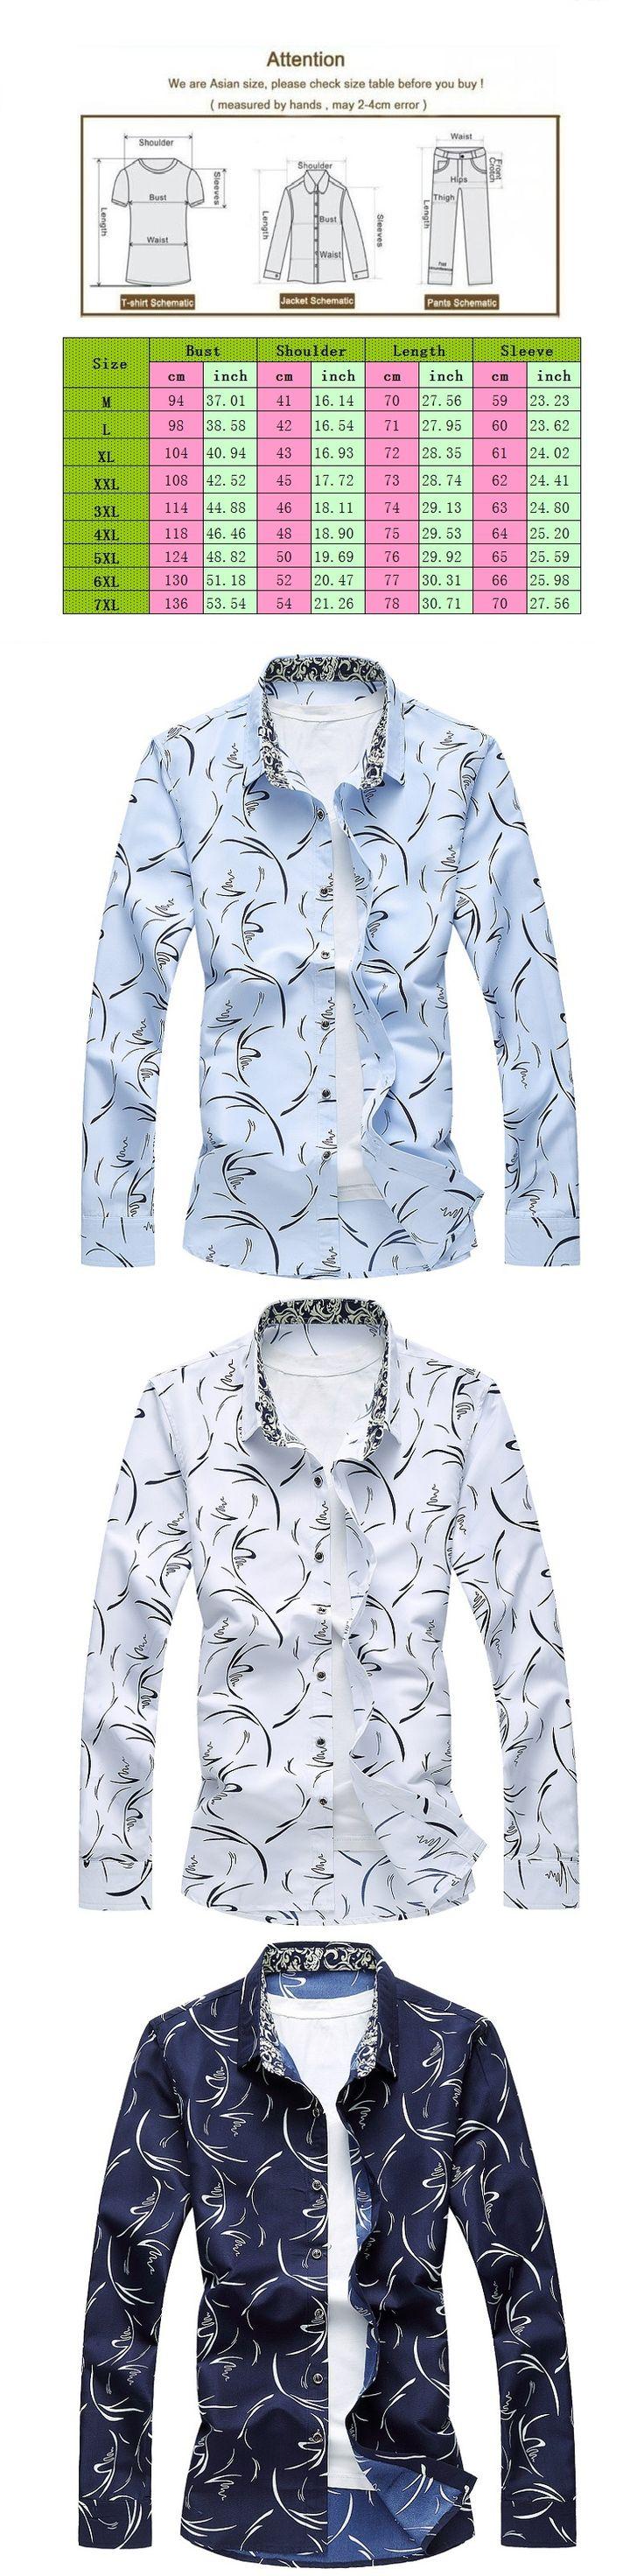 Men Floral Shirts 7XL Long Sleeve Mens Fancy Shirts Brand Clothing Party Wear Shirts For Men Hawaiian Shirt Camisa Masculina